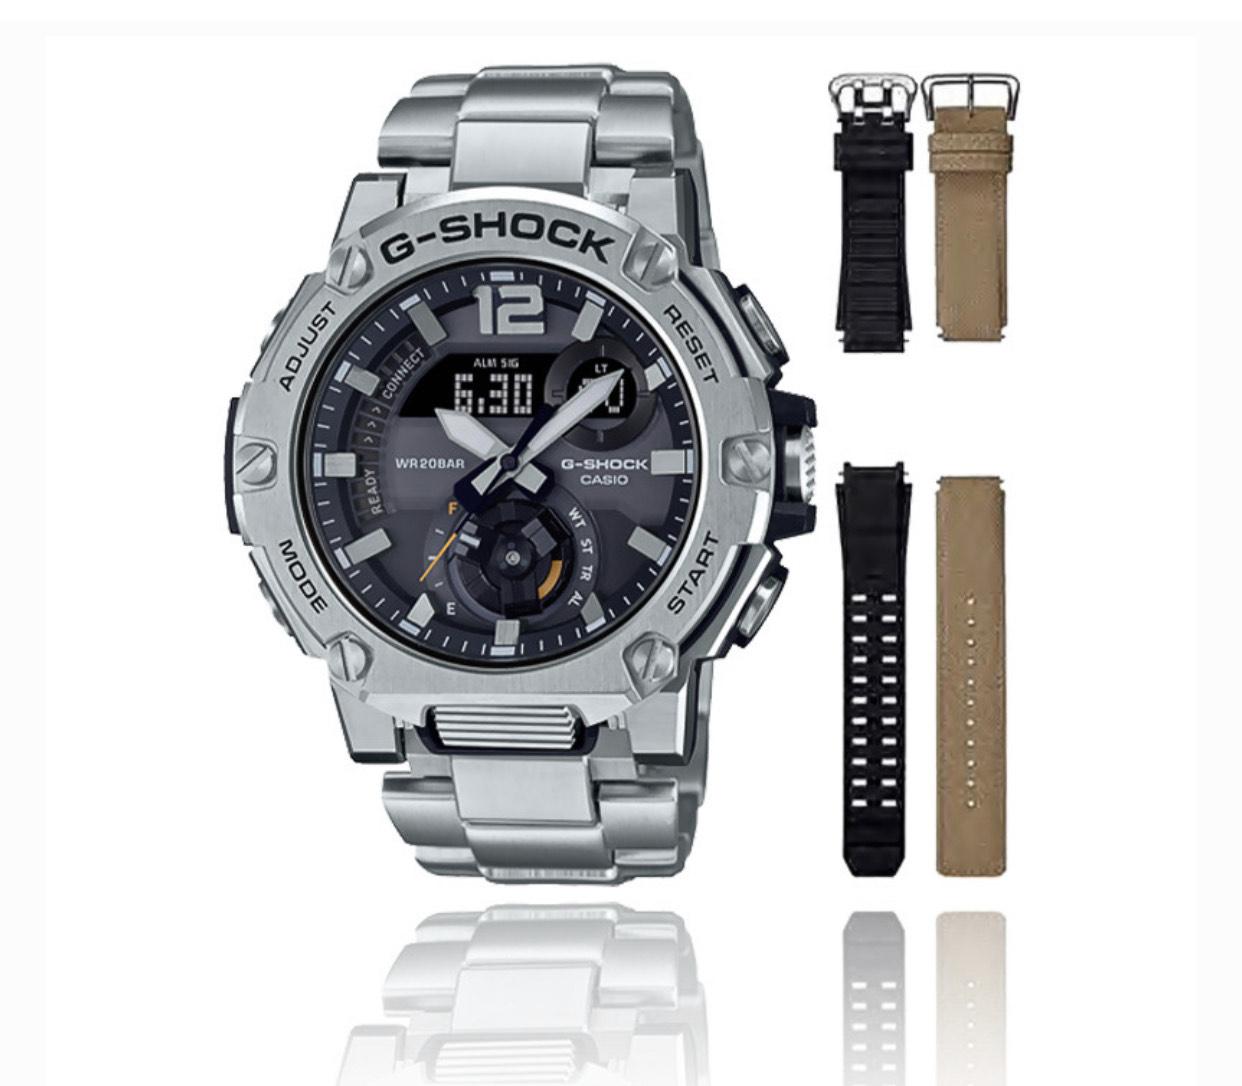 Montre G-Shock GST-B300E-5AER